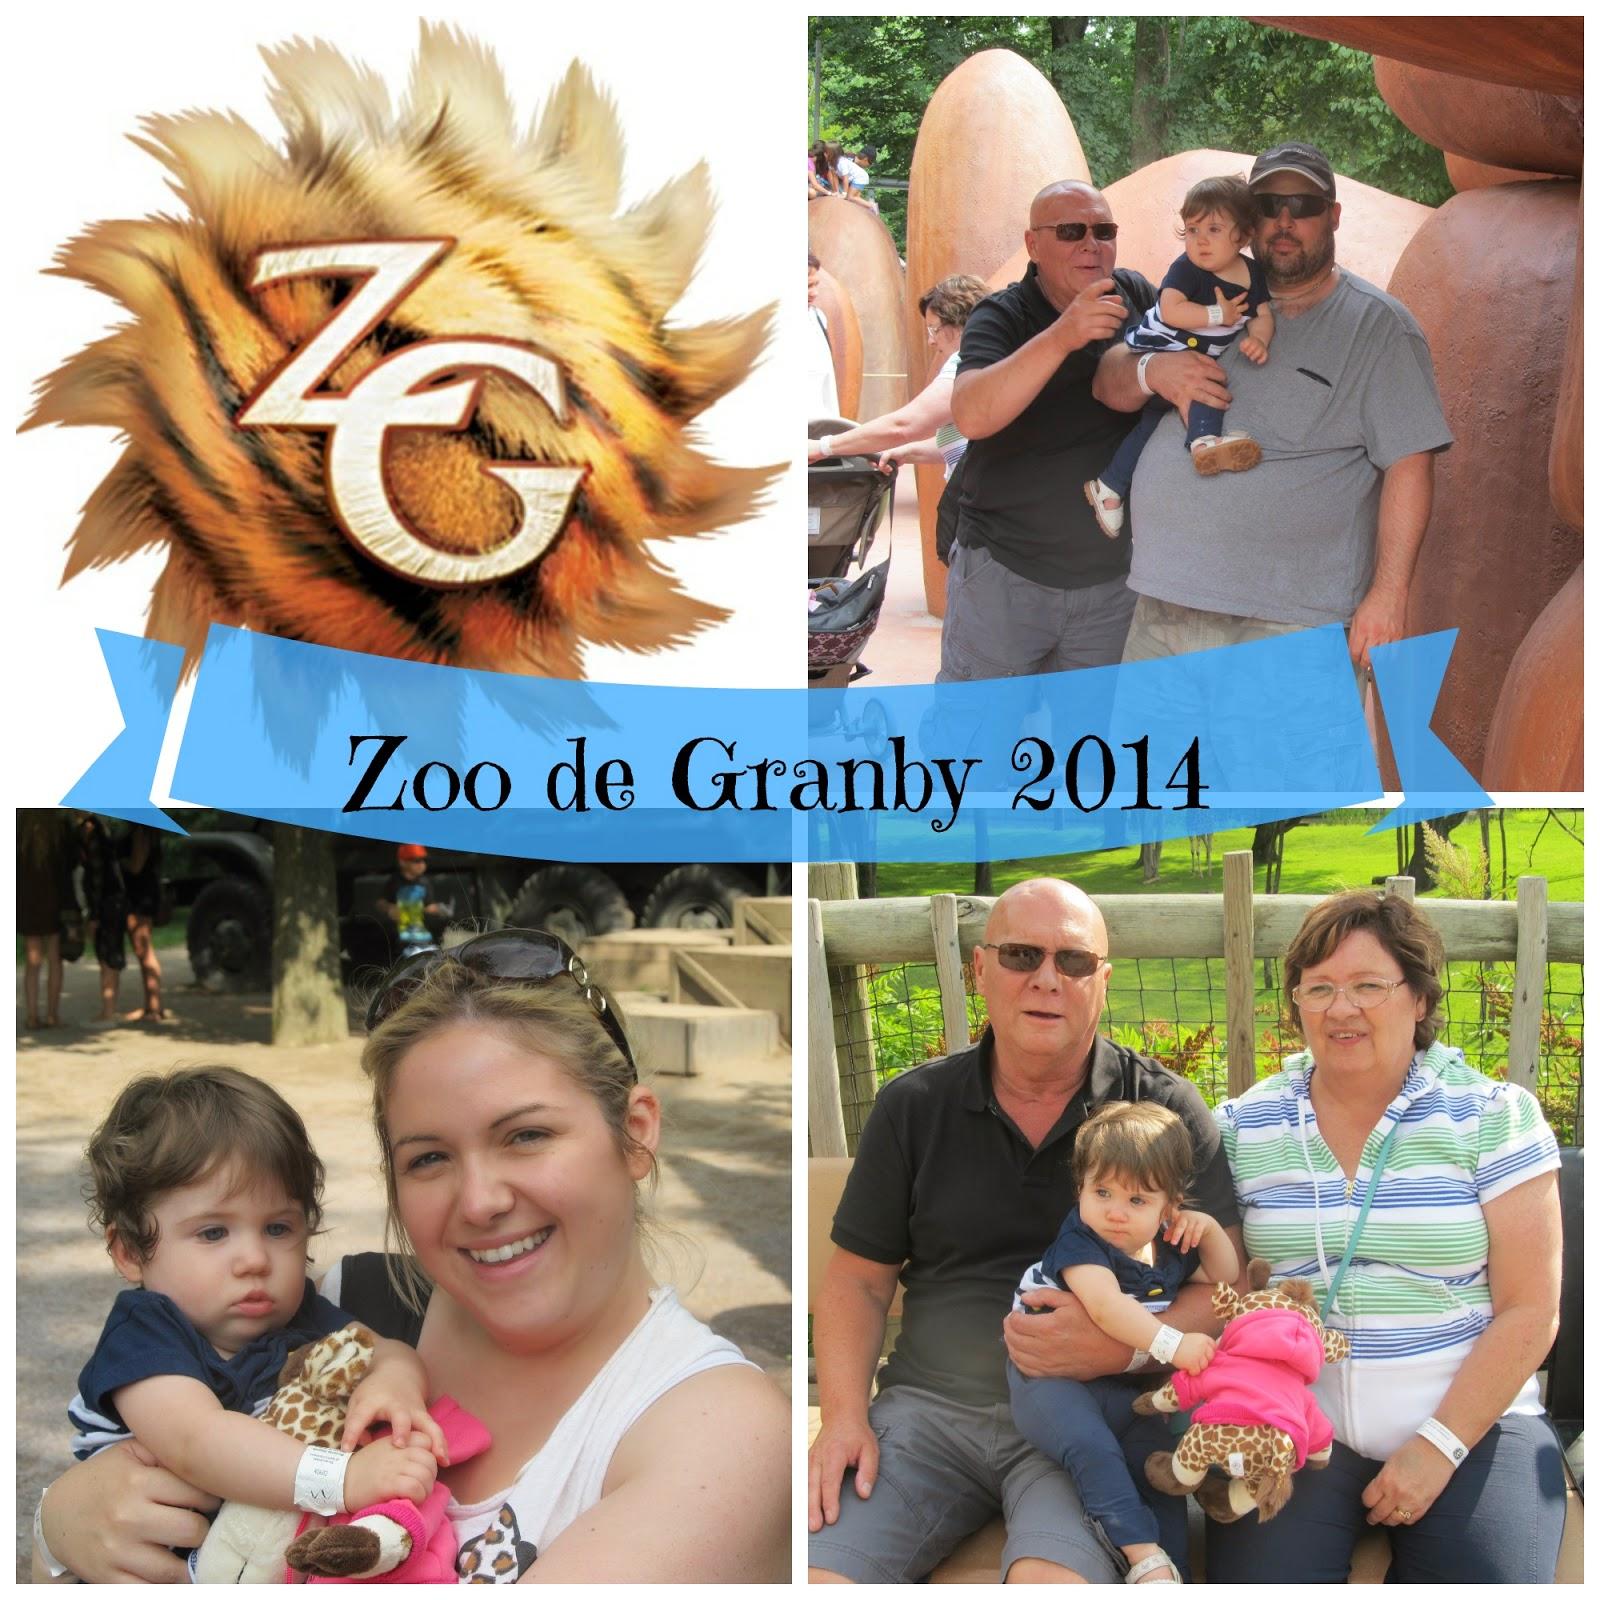 Escapade au Zoo de Granby en famille! #ZooDeGranby